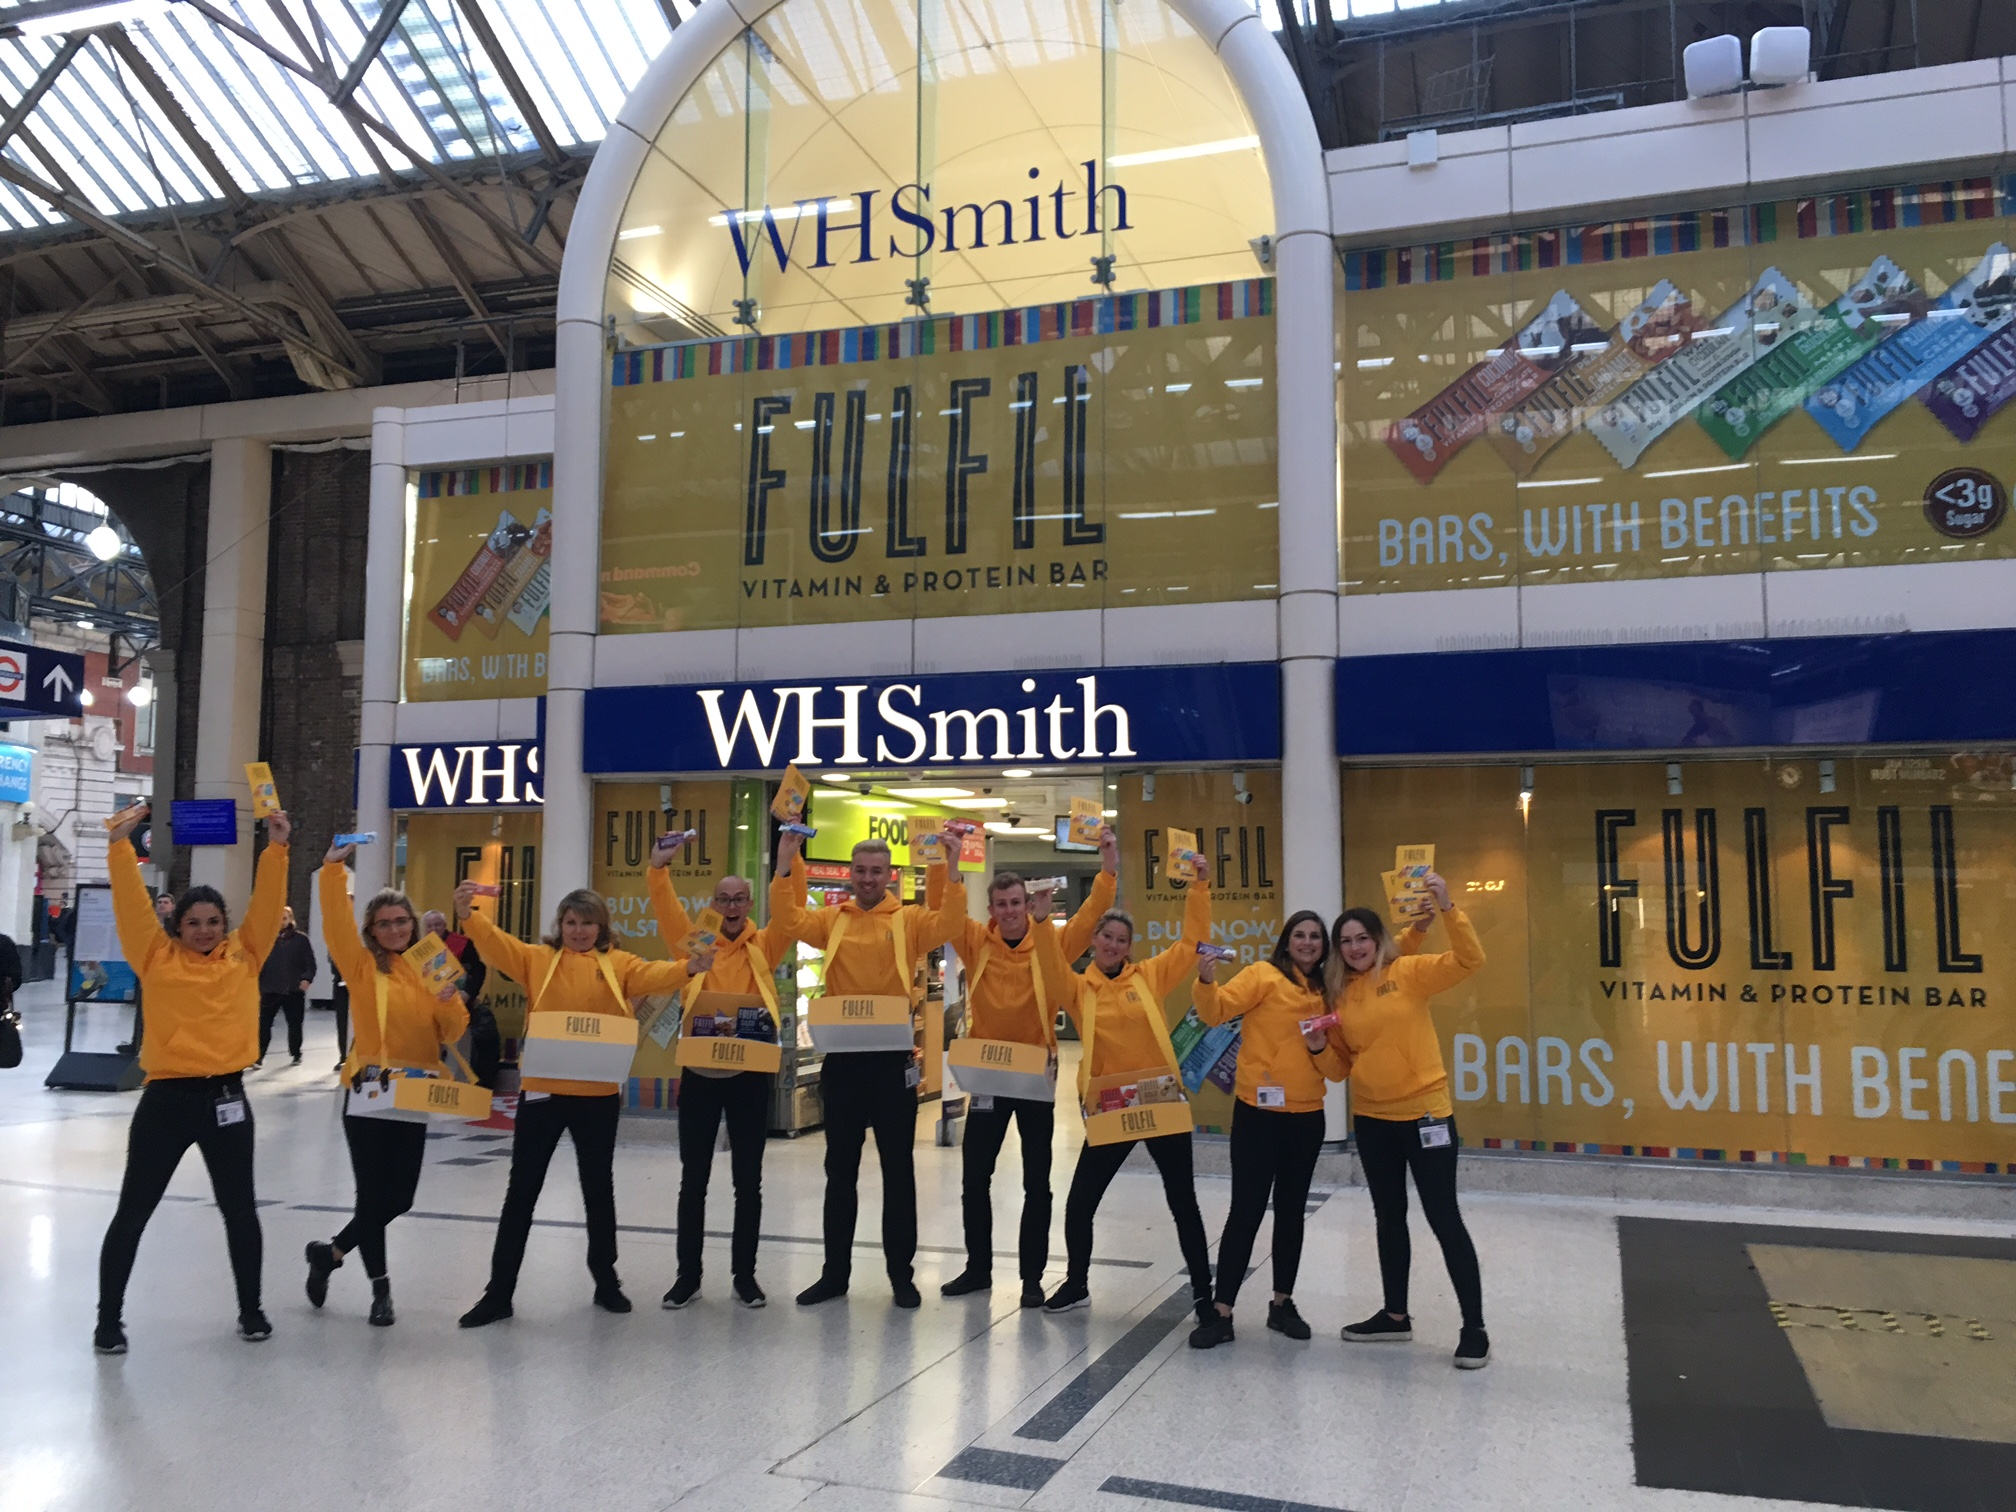 Experiential Marketing Product Sampling Fulfil - London